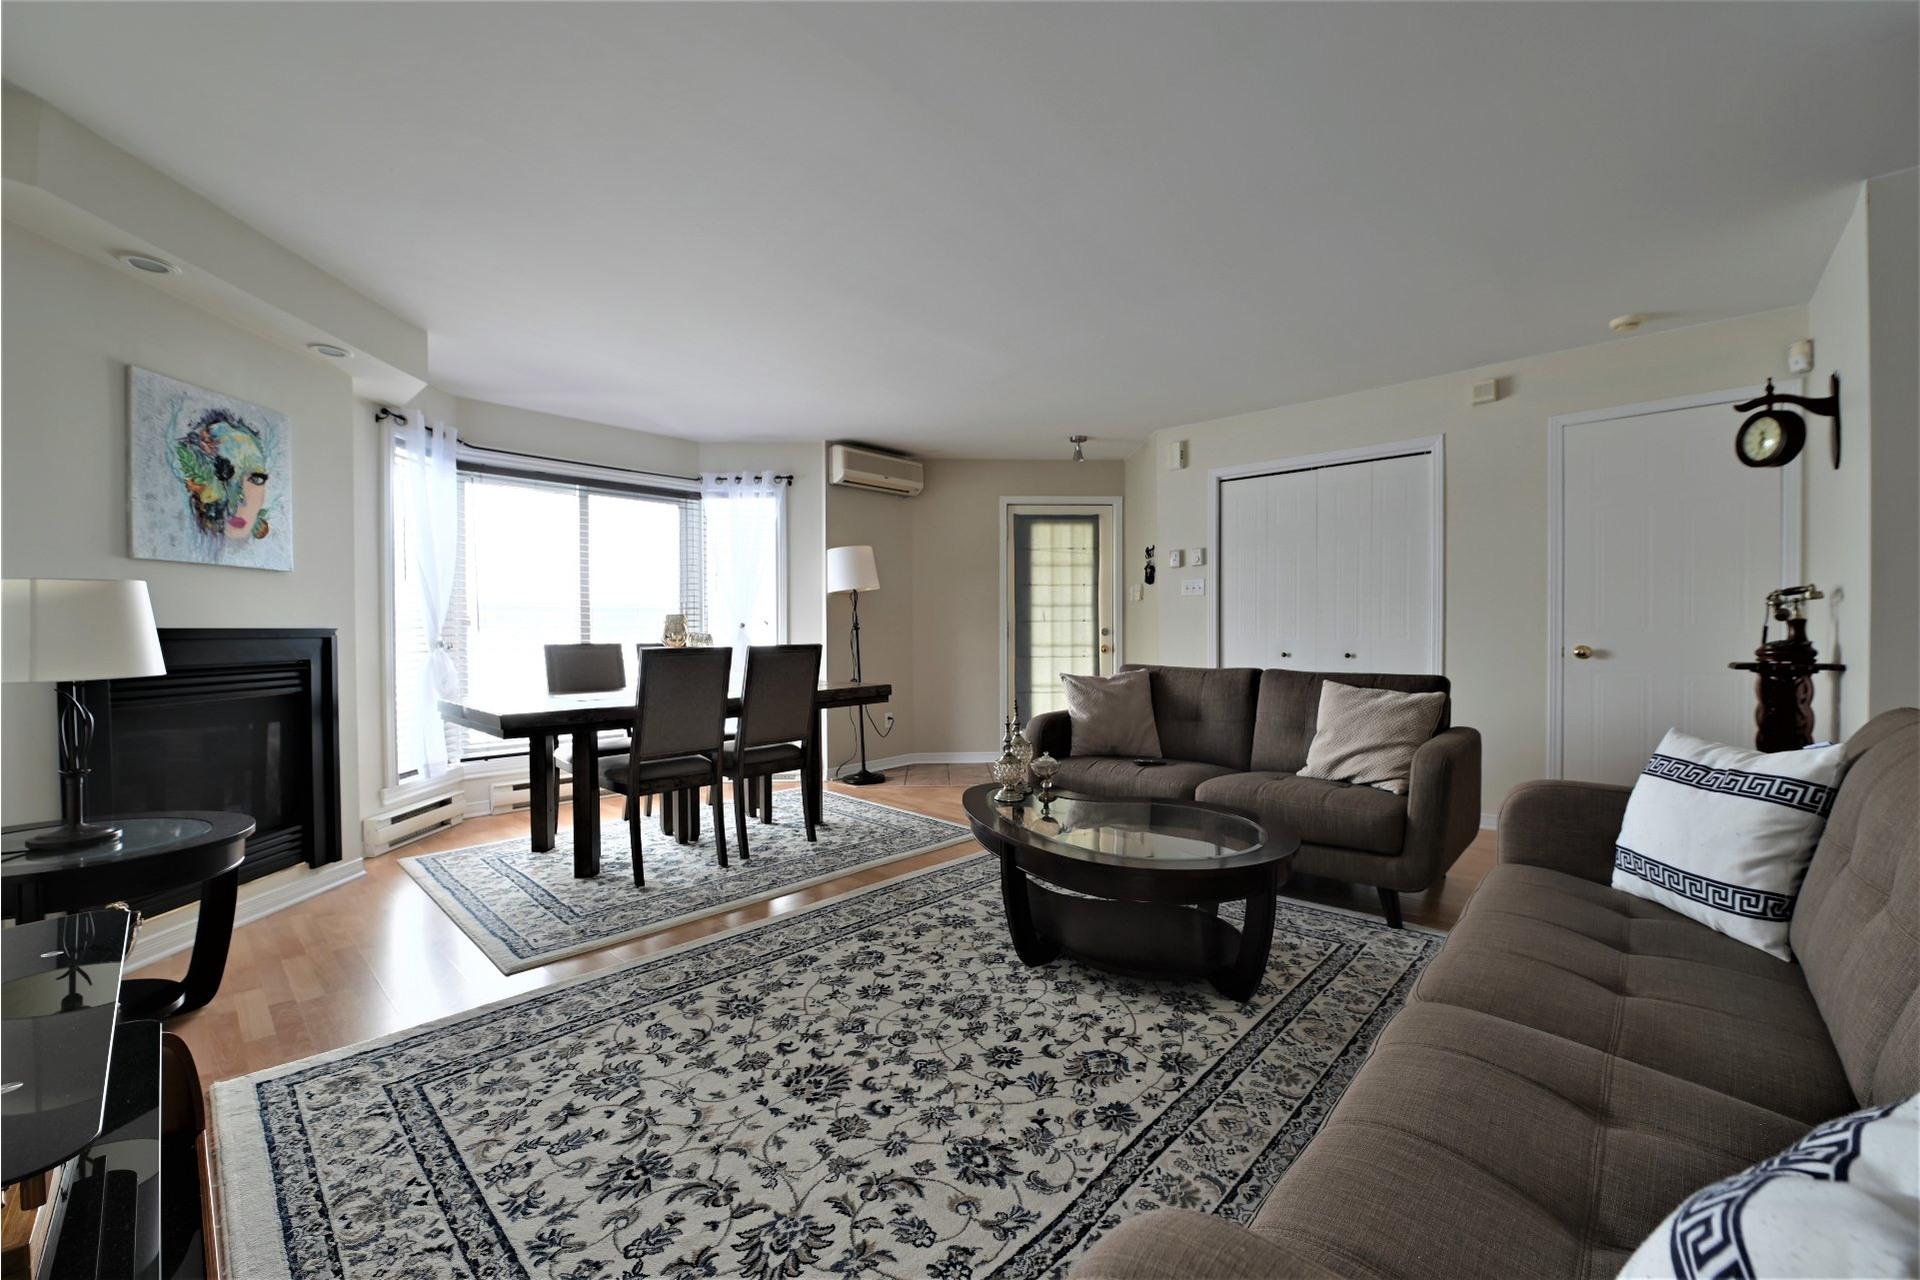 image 1 - 公寓 出租 La Prairie - 3 室